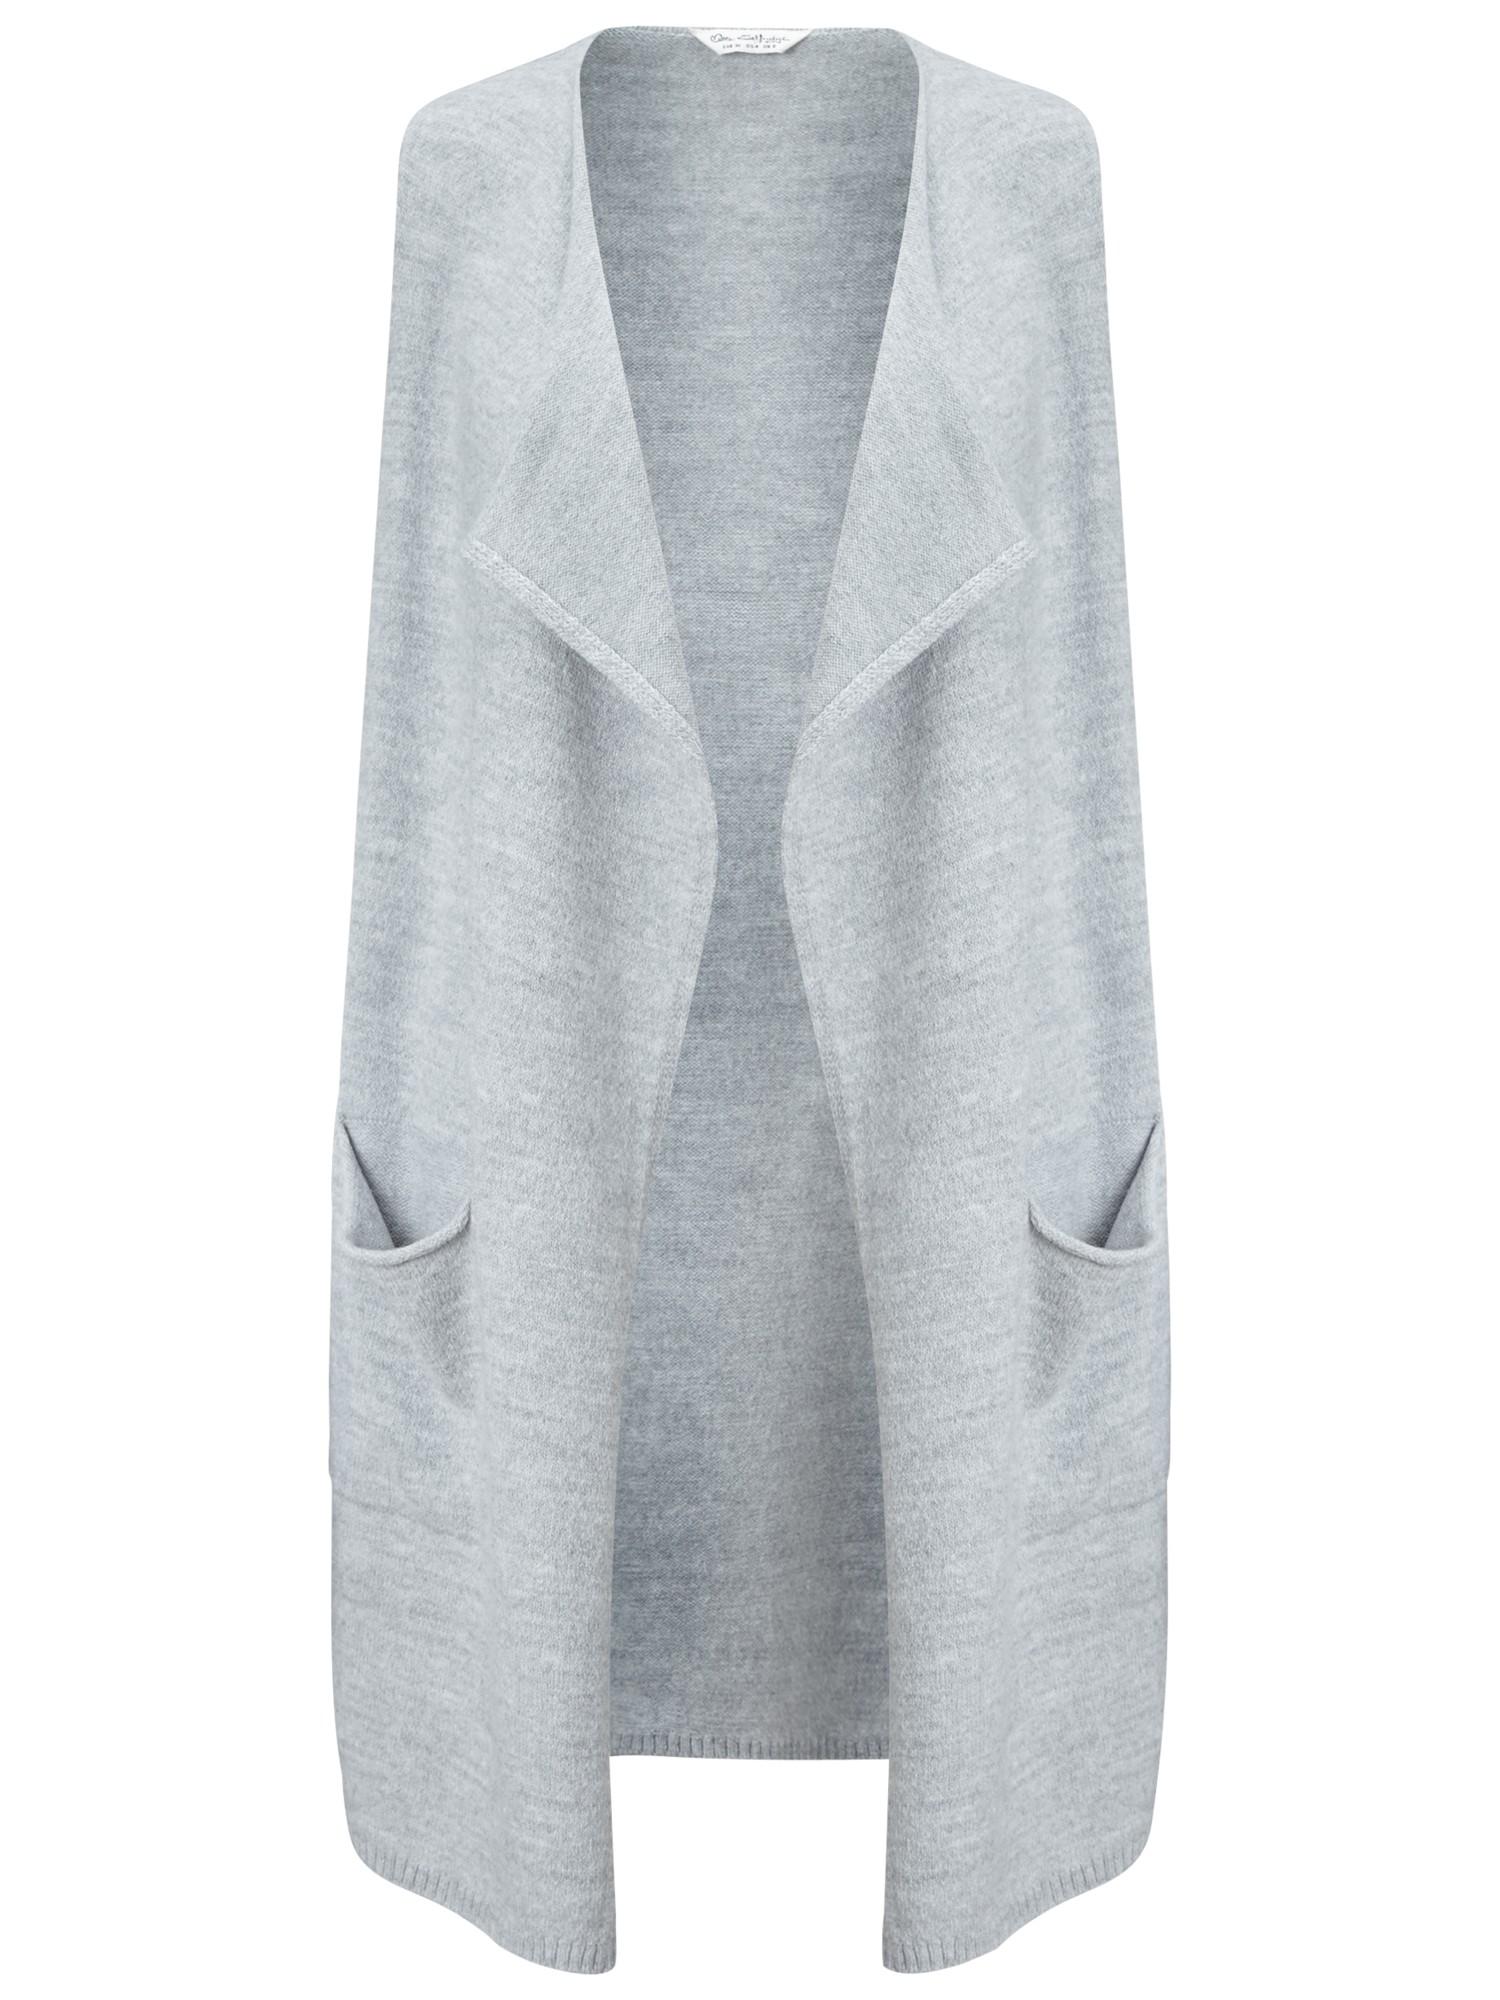 Magaschoni Light Grey Long Sleeve Cashmere Waterfall Cardigan